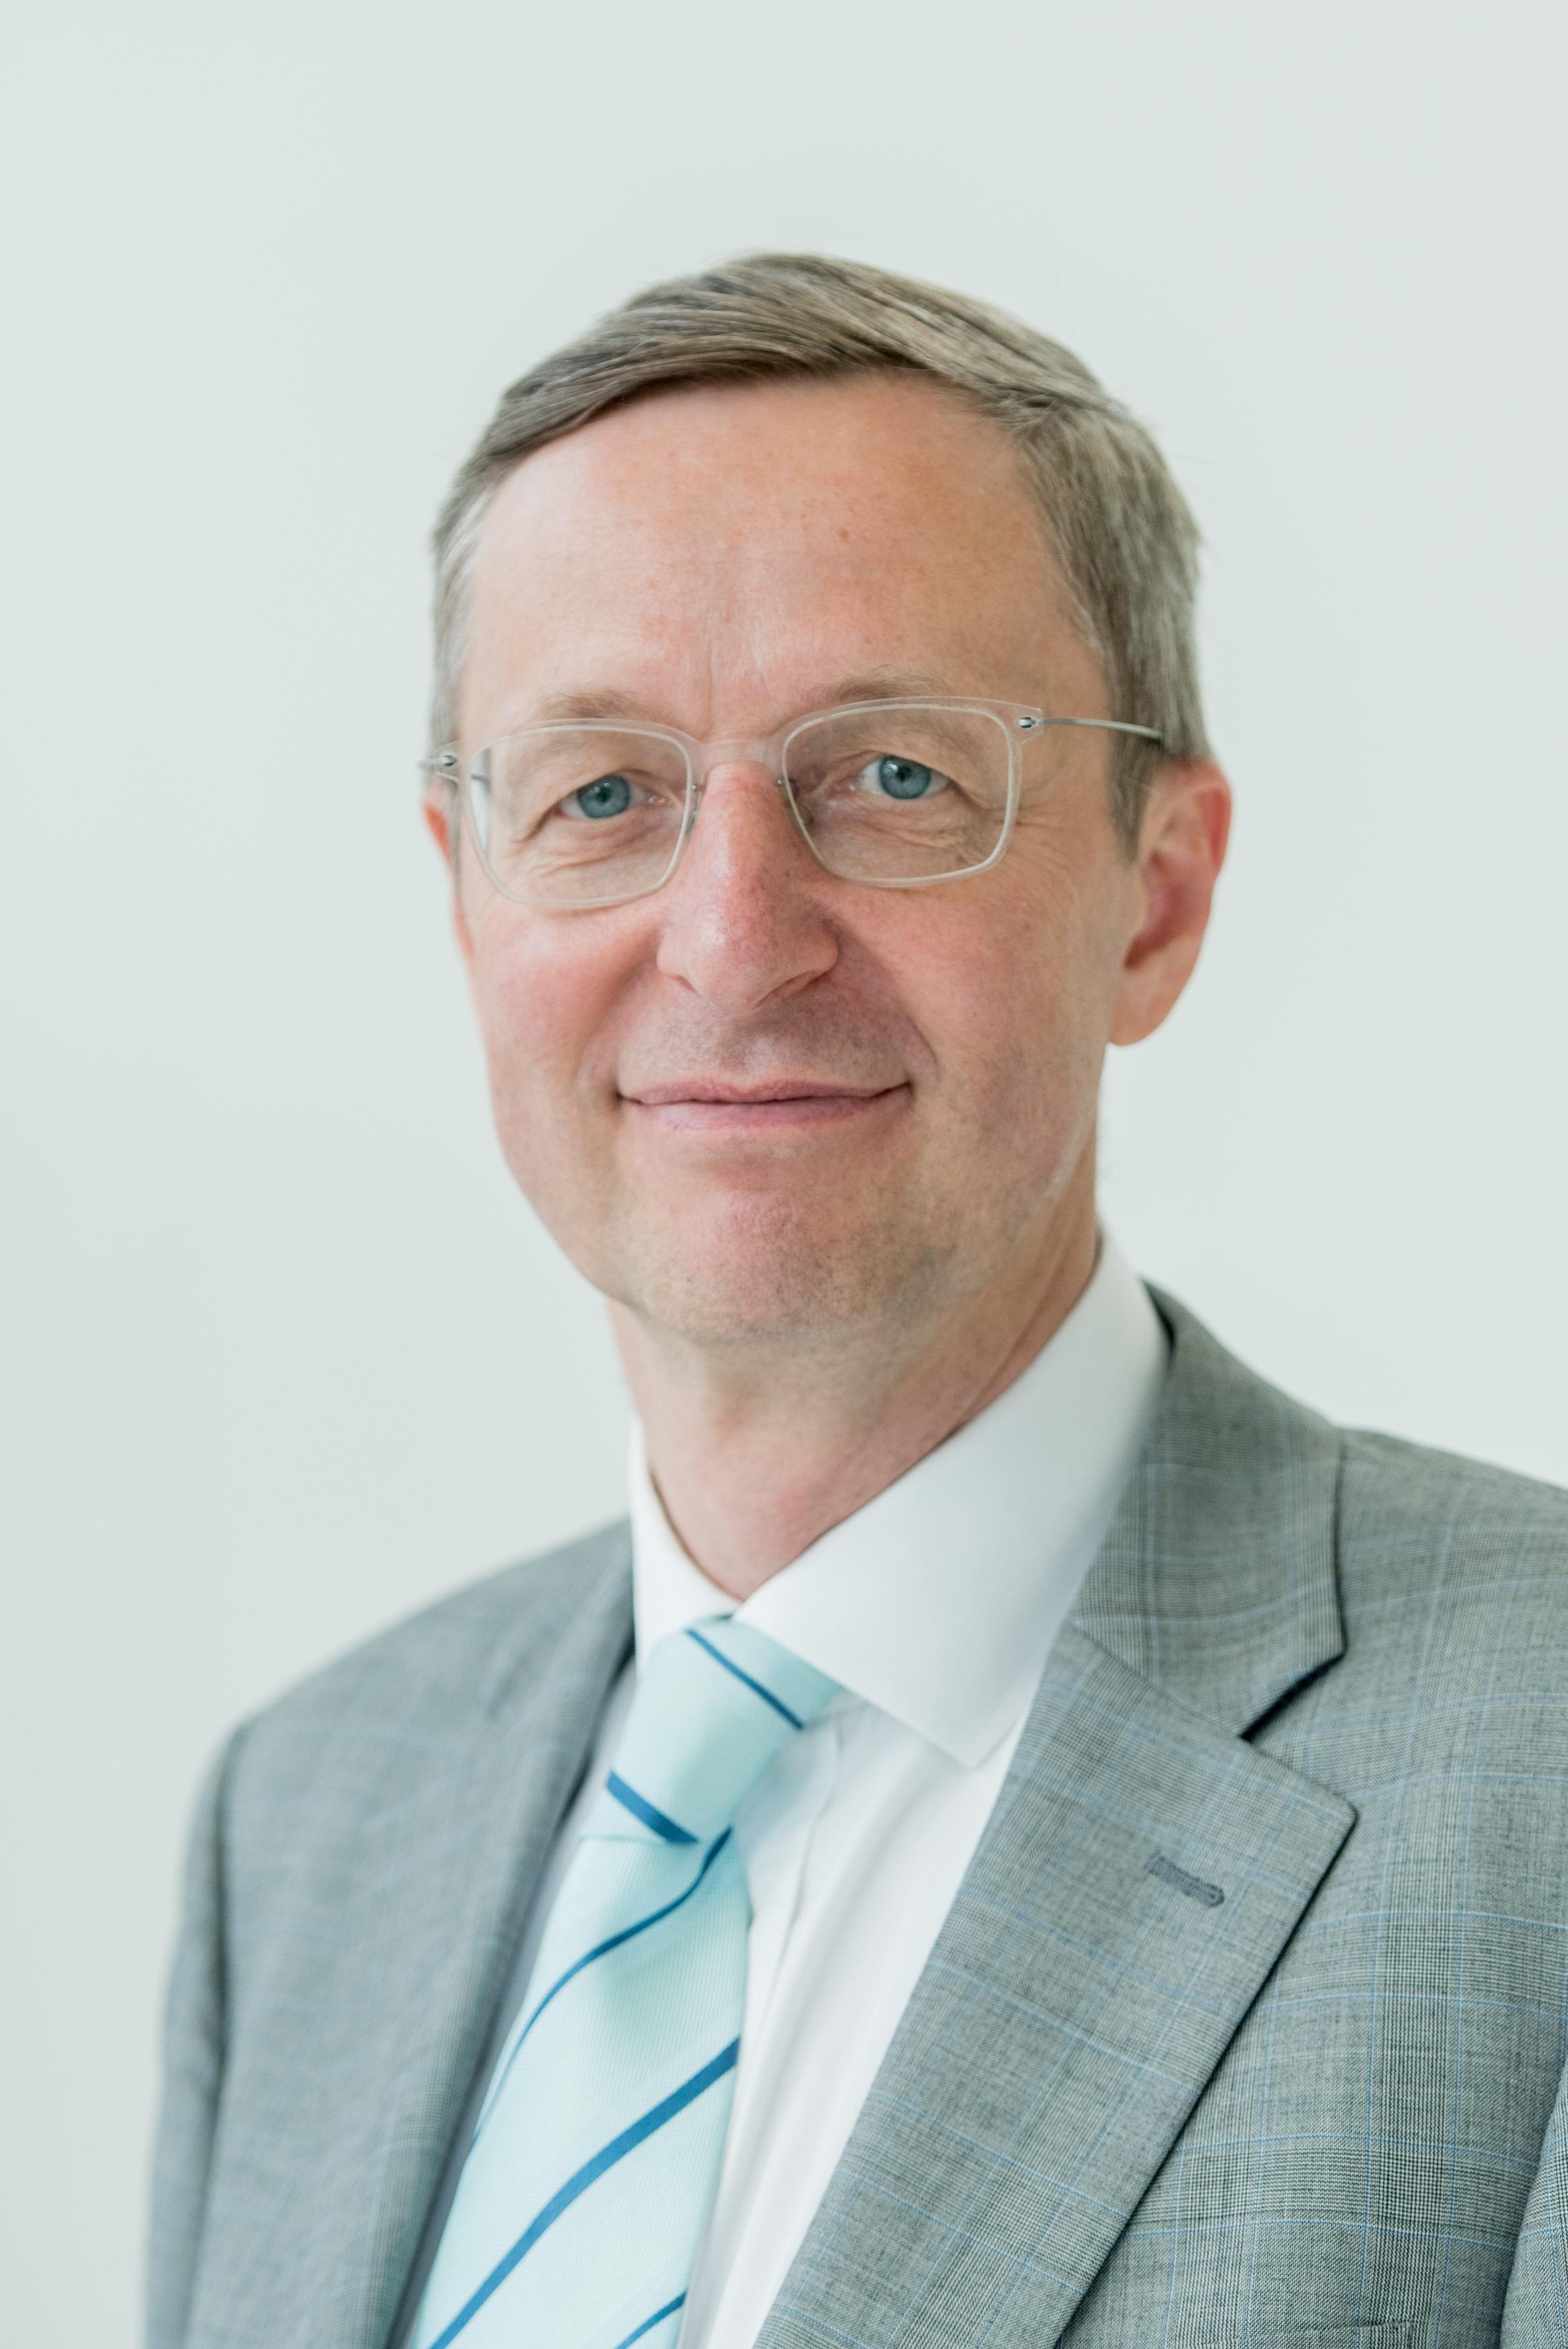 Michael Harms